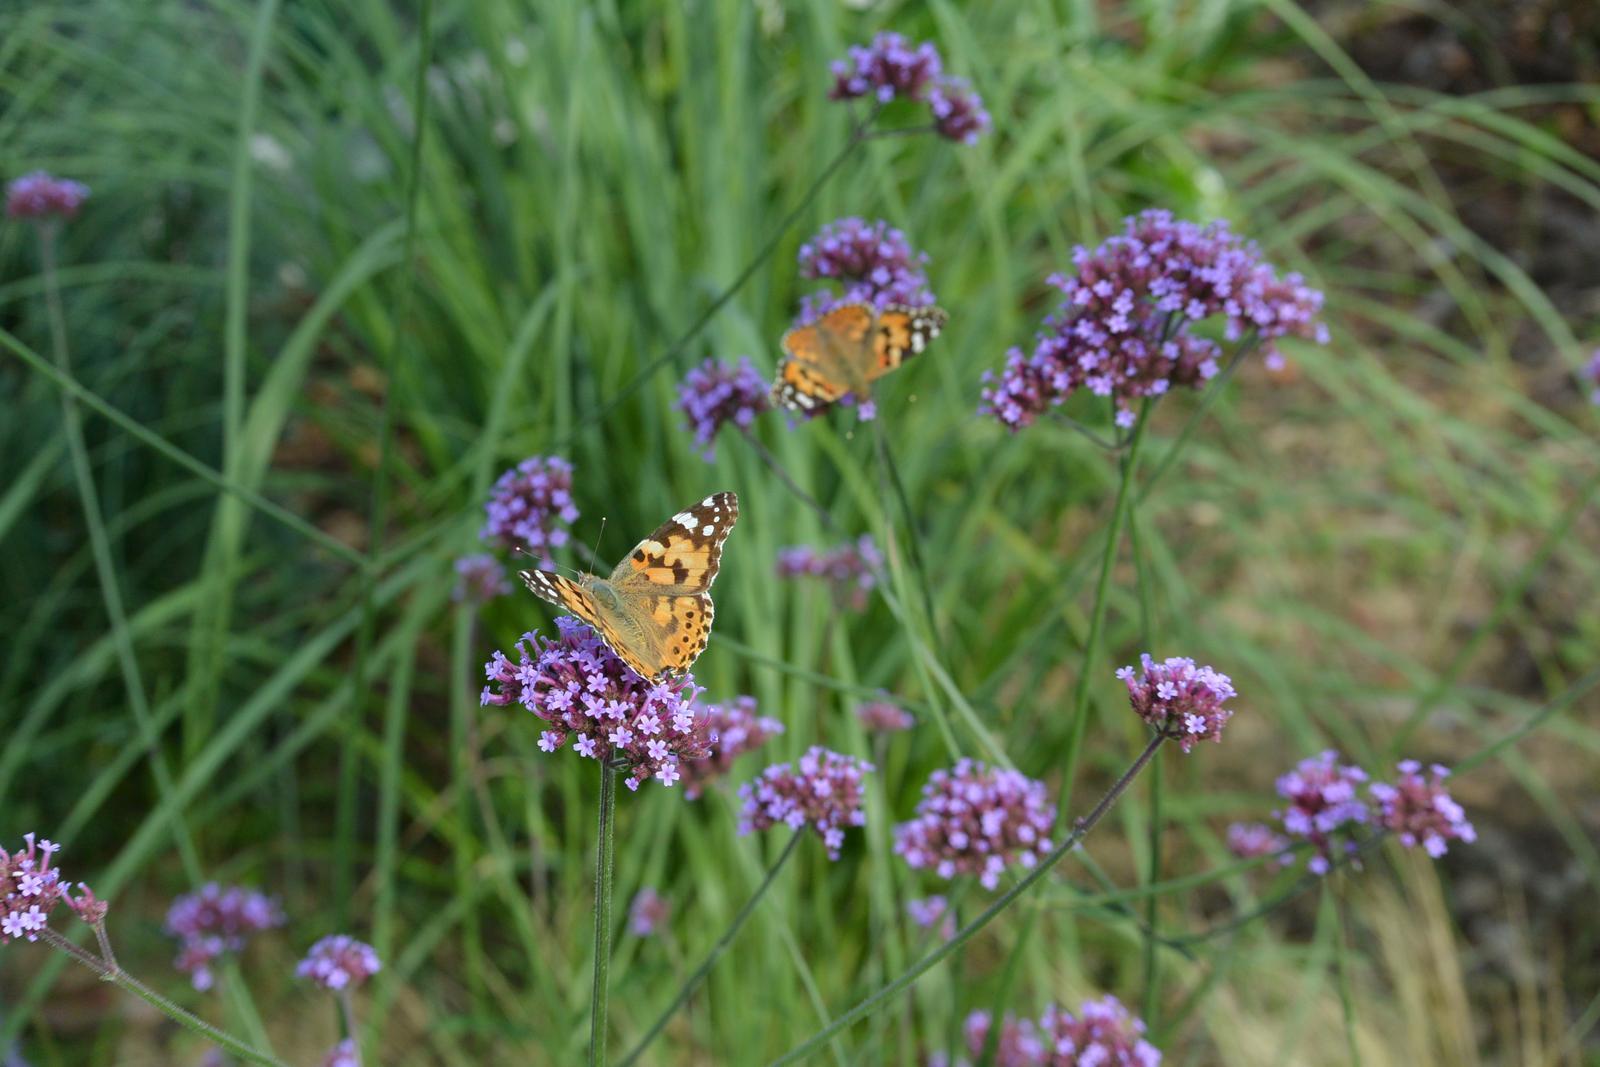 Motýlí zahrada 2019-2020 - Obrázek č. 58